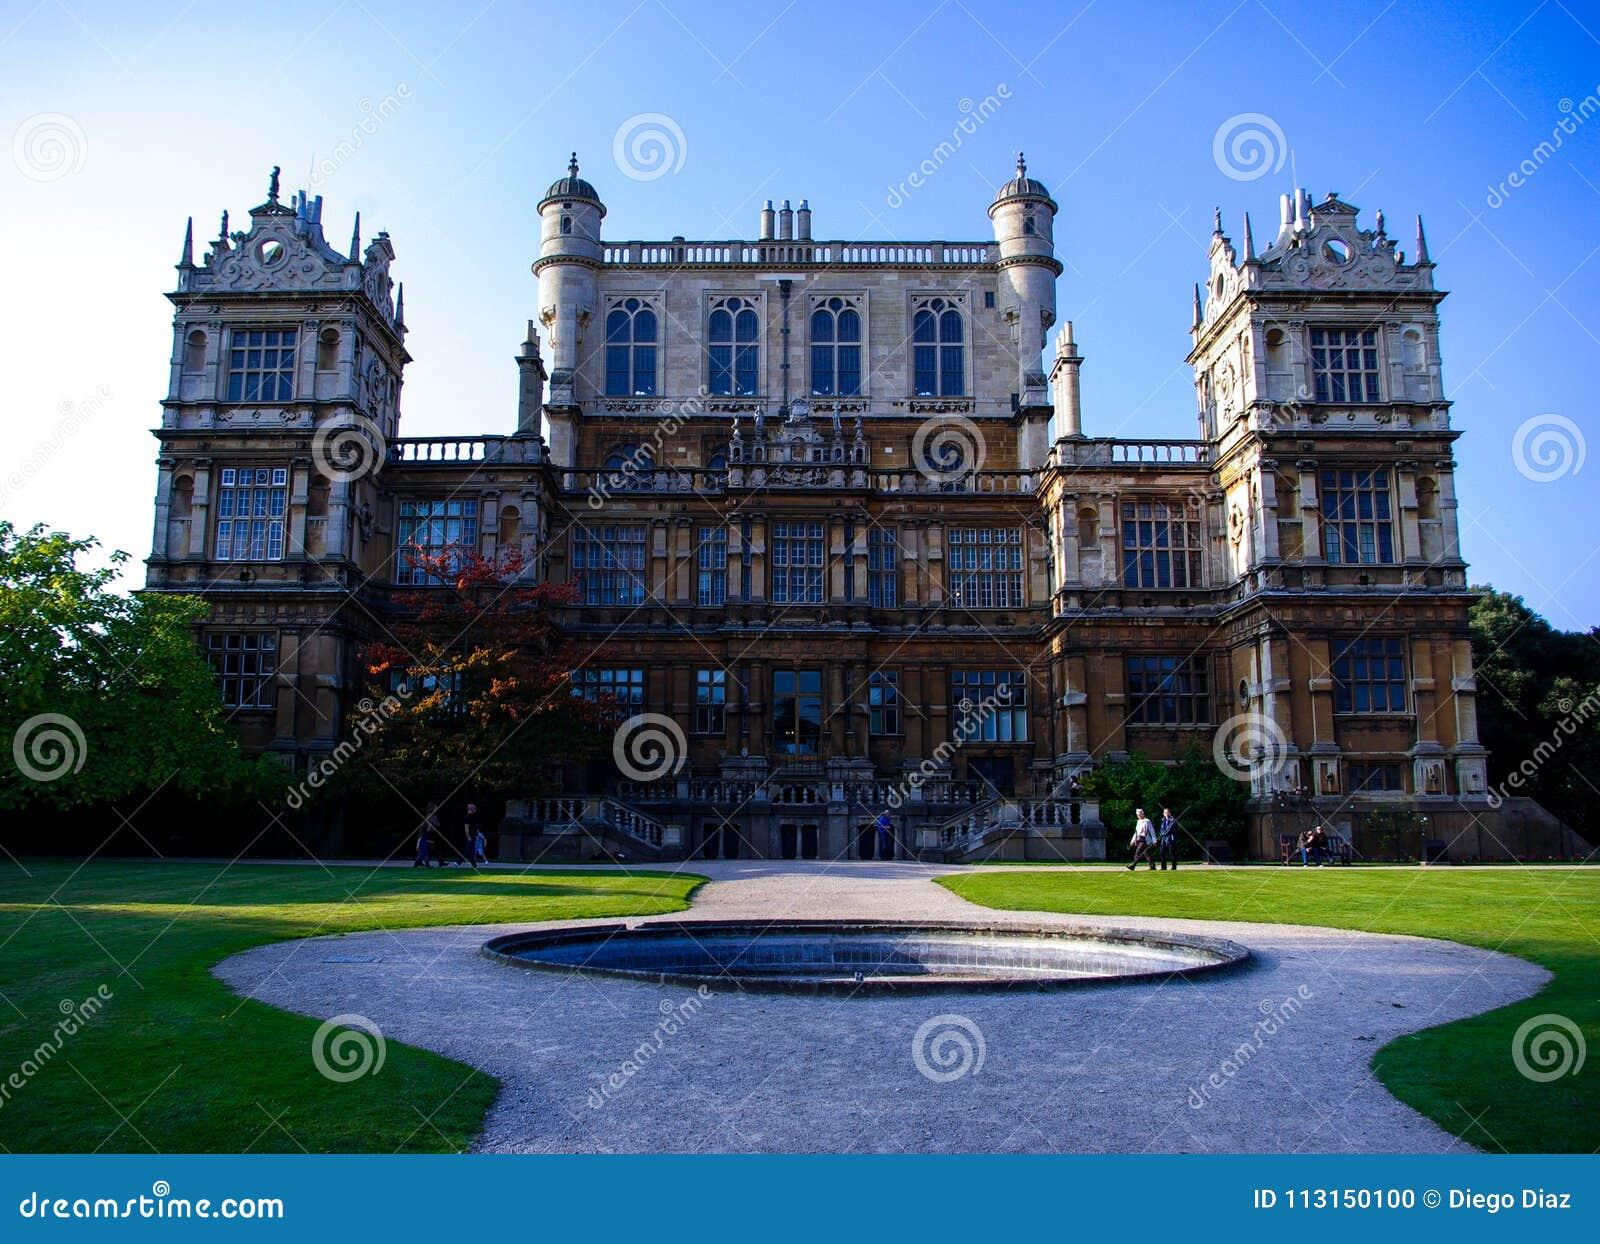 Facade of Wollaton Hall in Nottingham